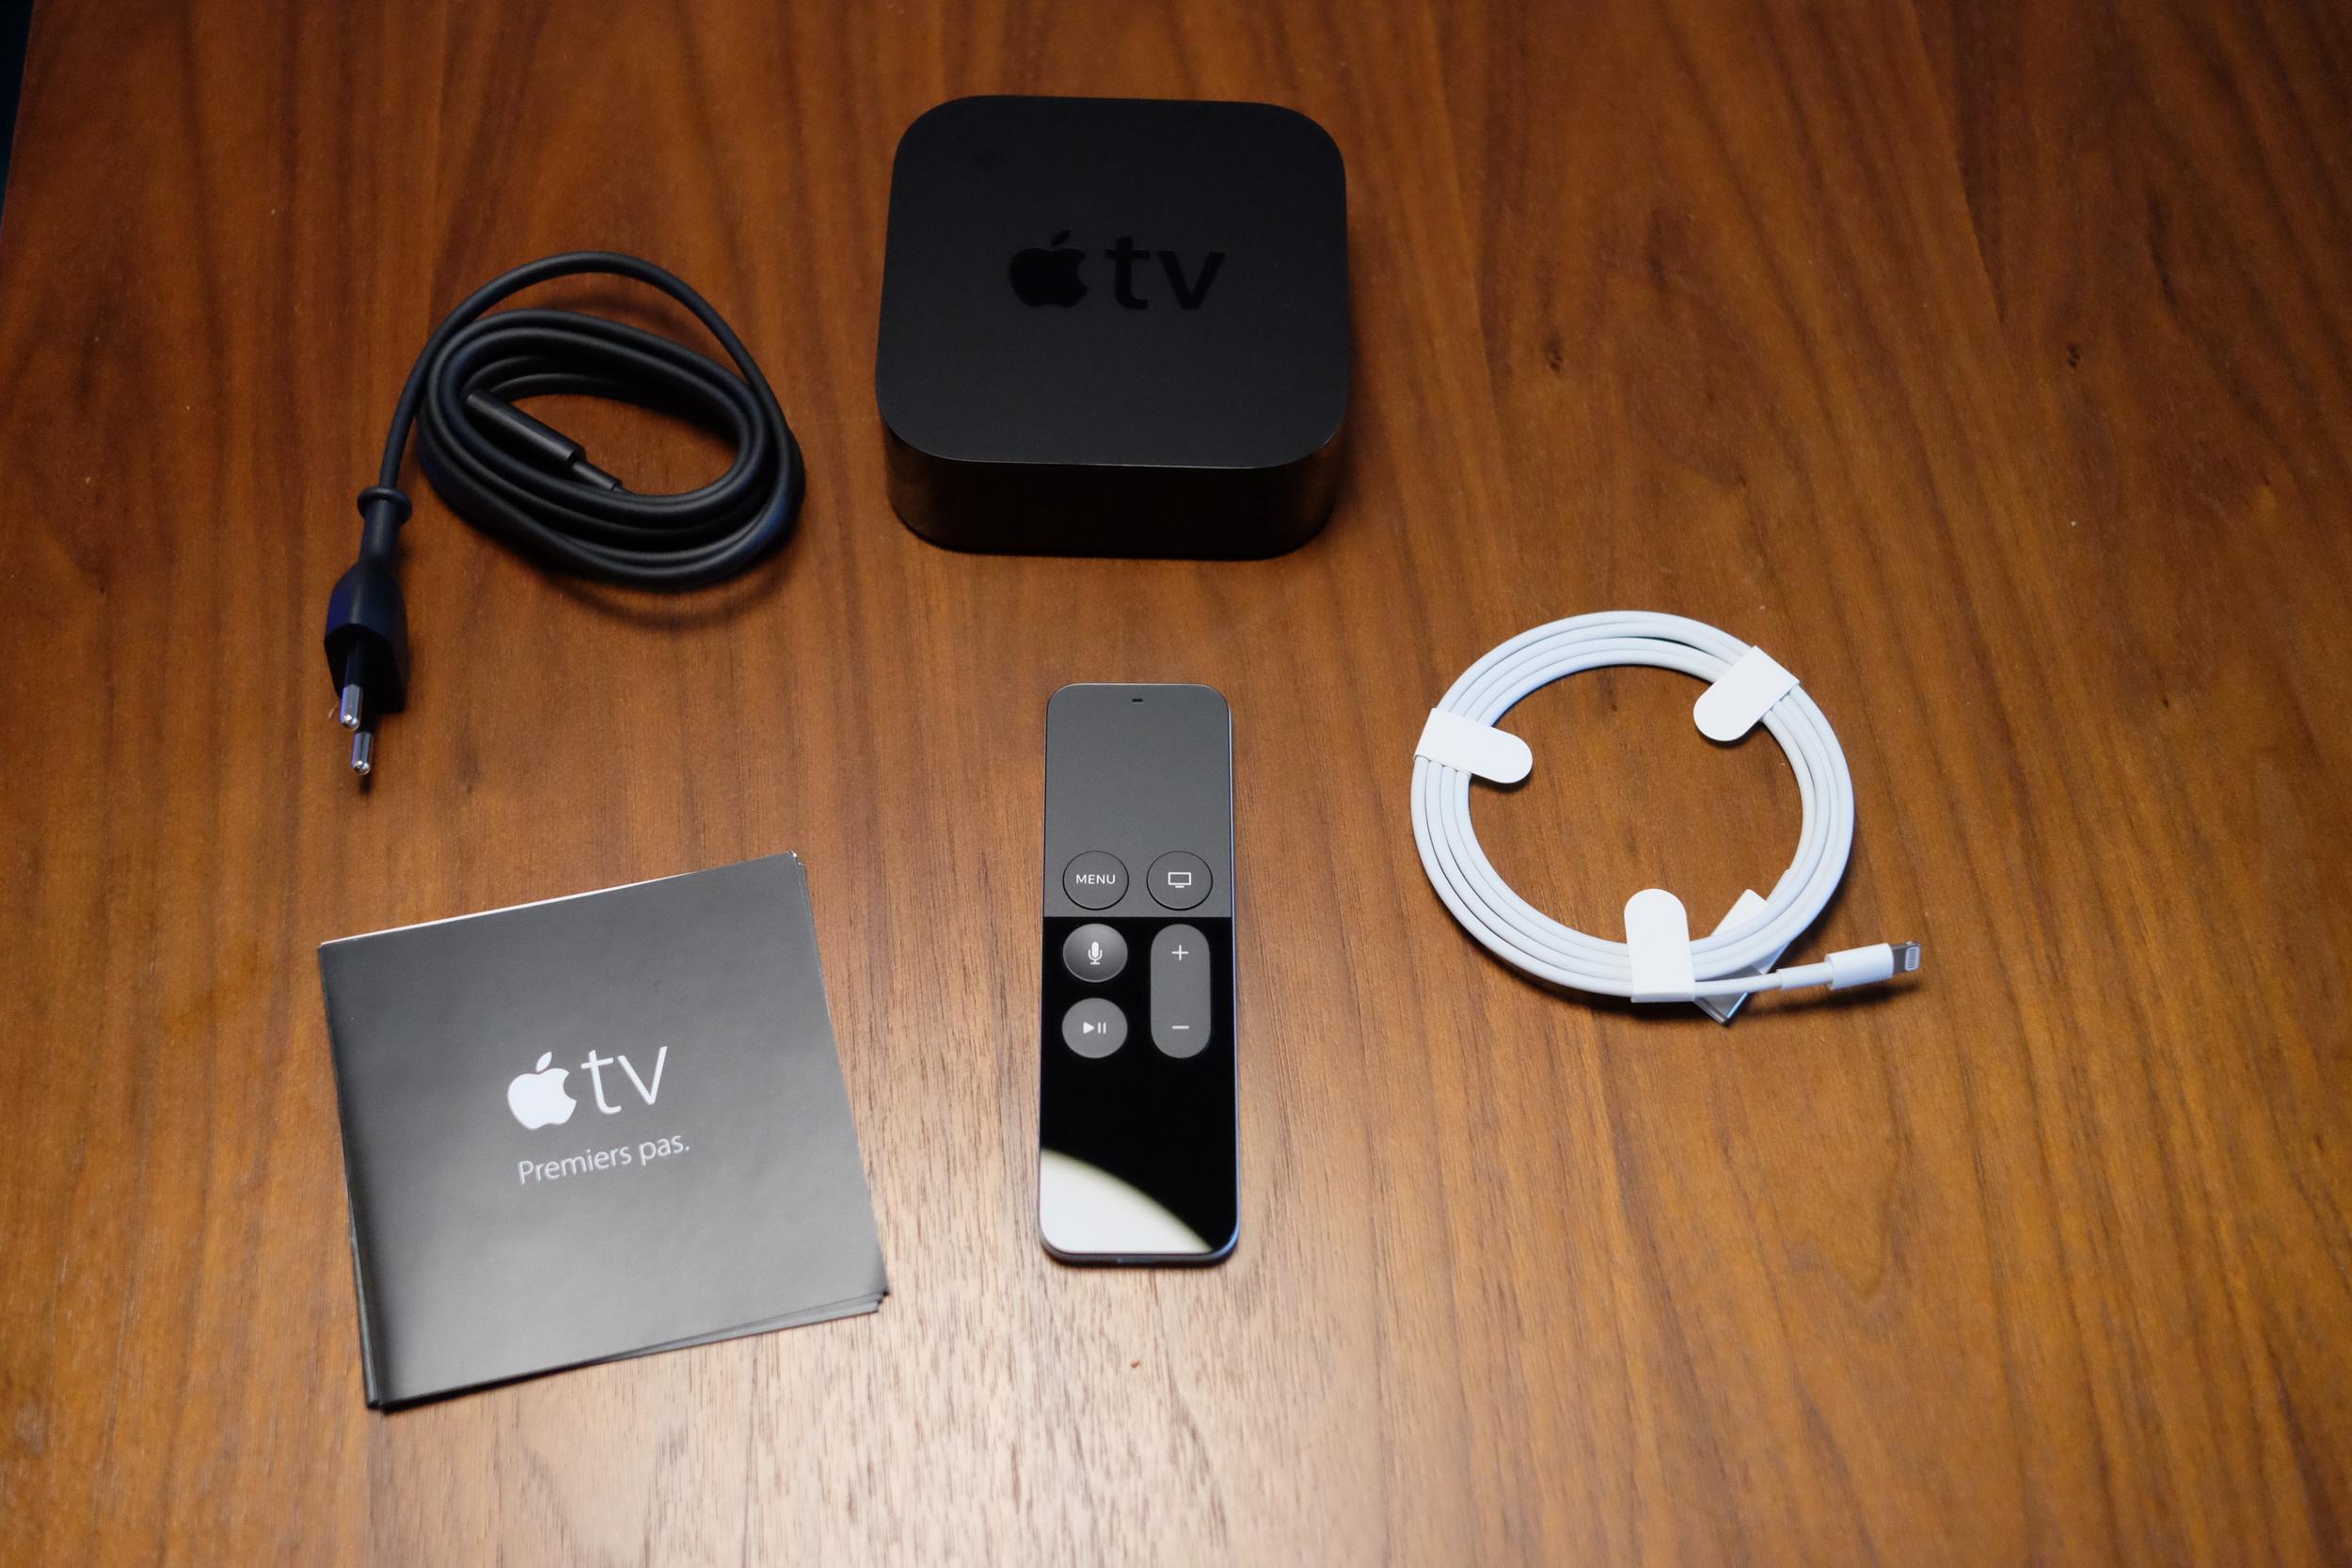 Apple TV 4 package content - Photograph Philippe Regnier